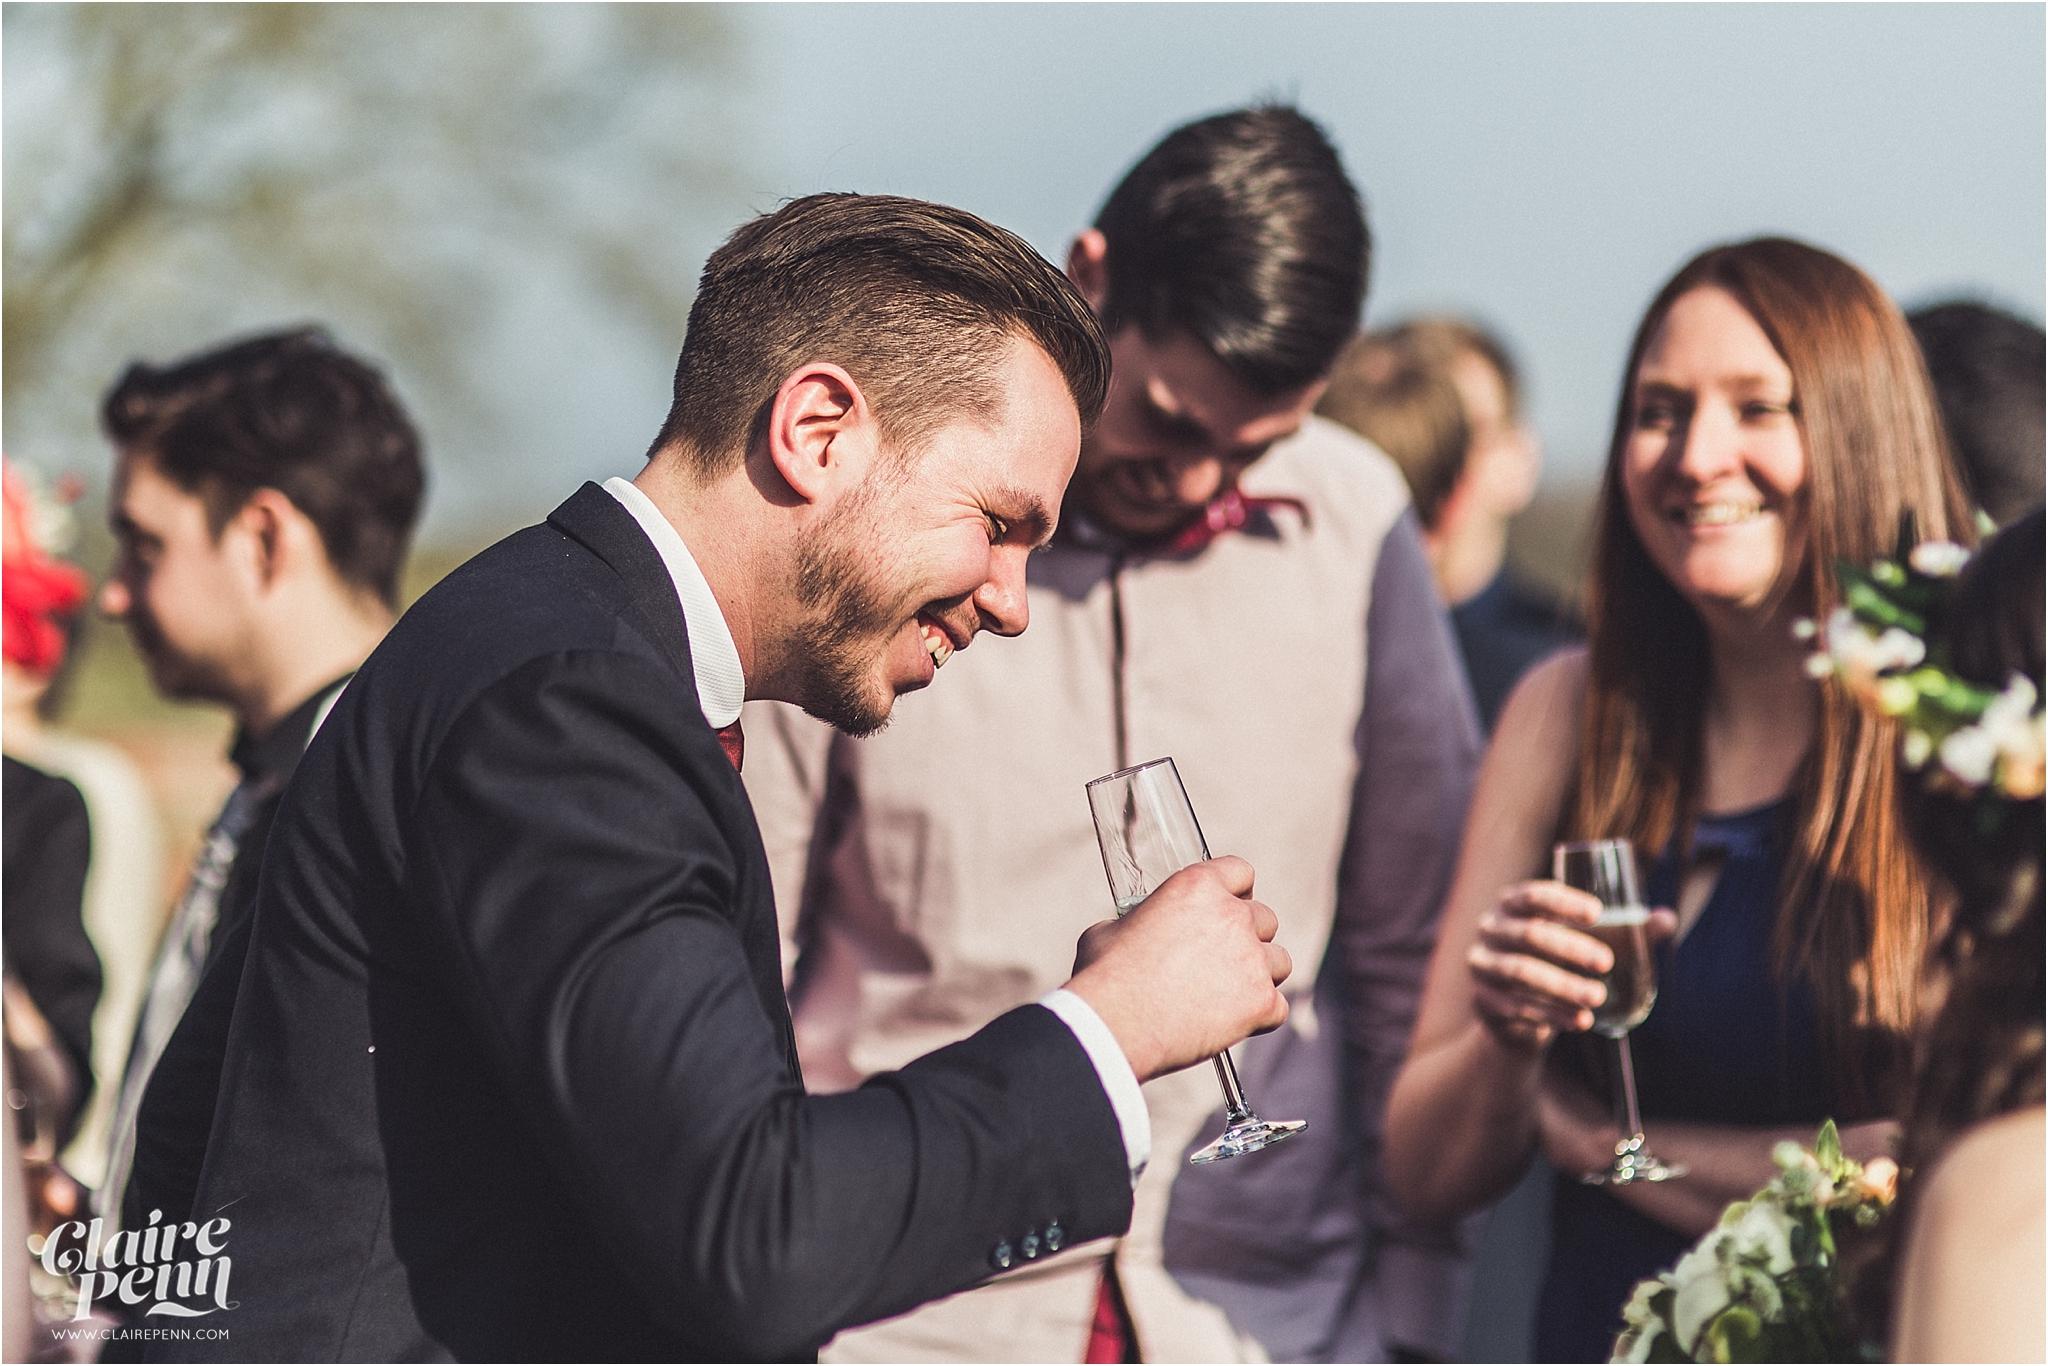 Iscoyd Park wedding, Whitchurch, Cheshire wedding photographer_0029.jpg